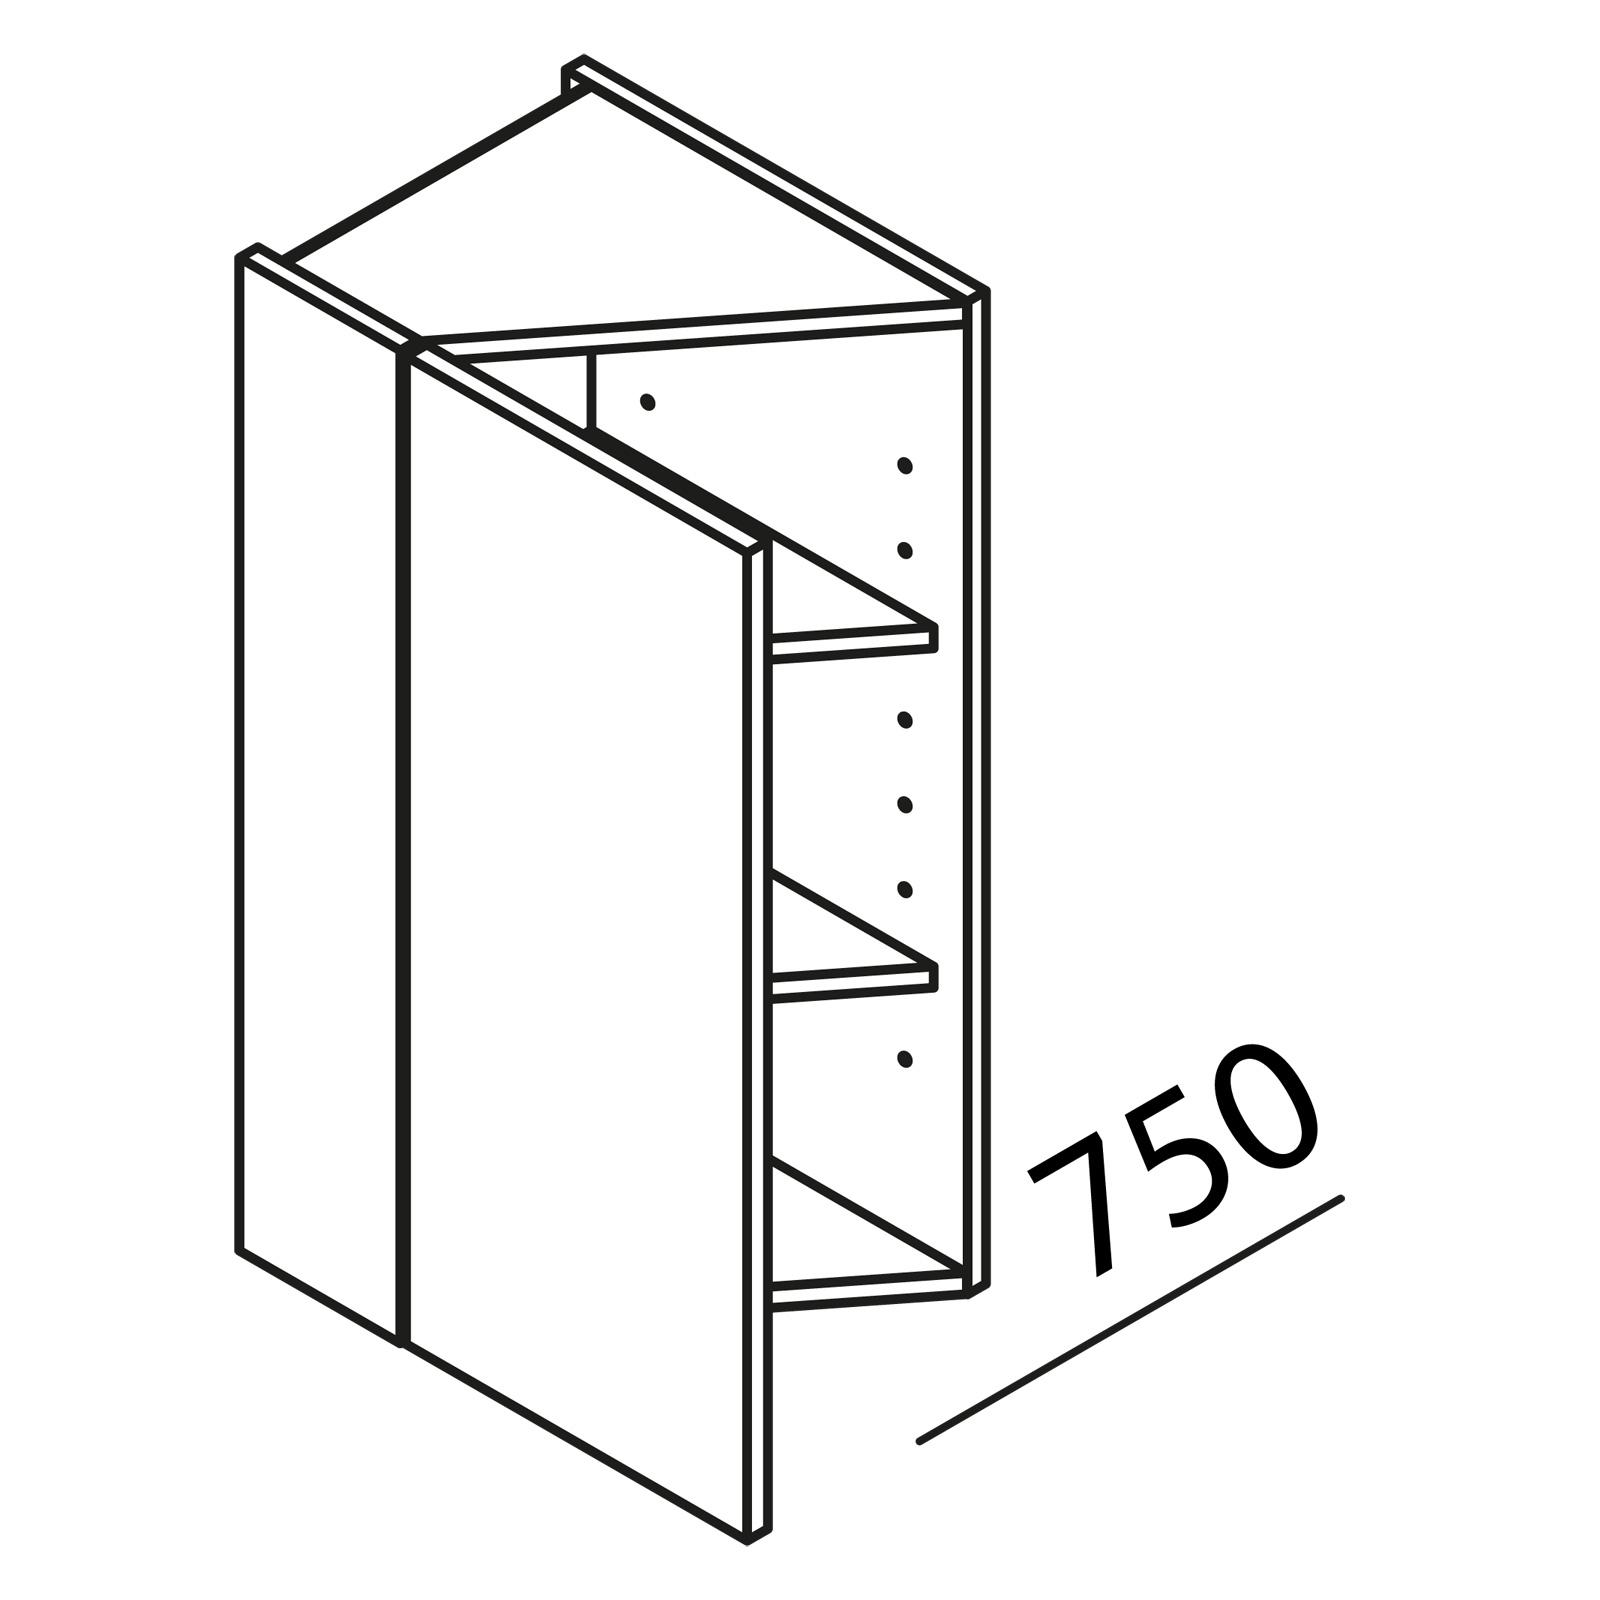 Nolte Küchen Hängeschrank Diagonalschrank HVS30-75